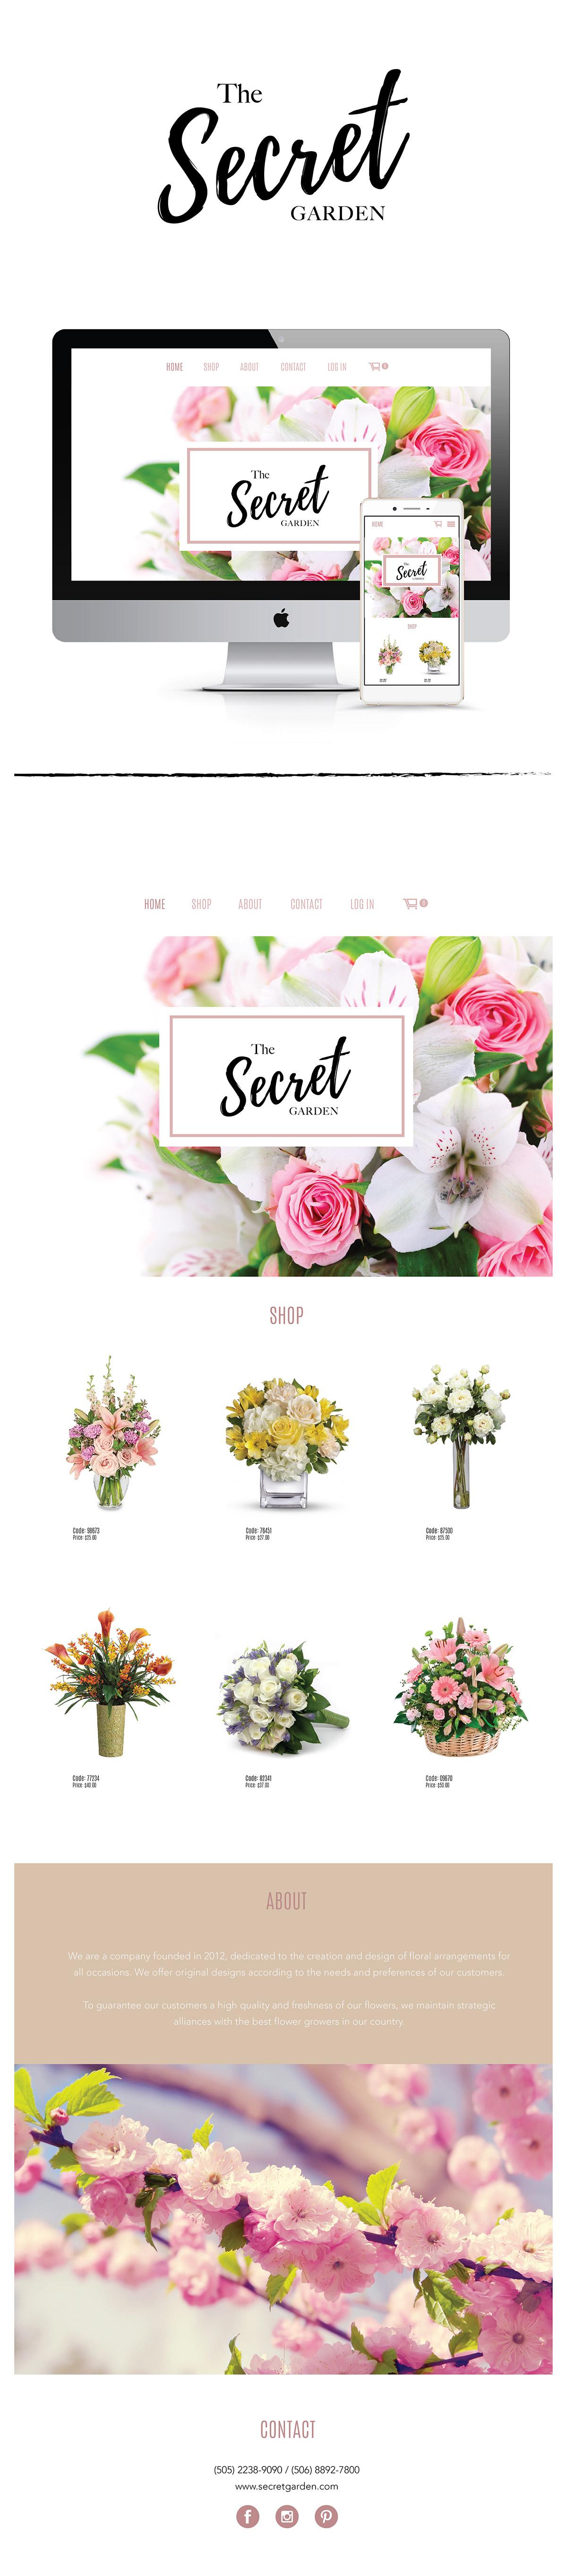 Design of a logo and a website for the company of floral arrangements The Secret Garden. // Diseño de un logo y un sitio web para la empresa de arreglos florales The Secret Garden.This is not a real proyect.